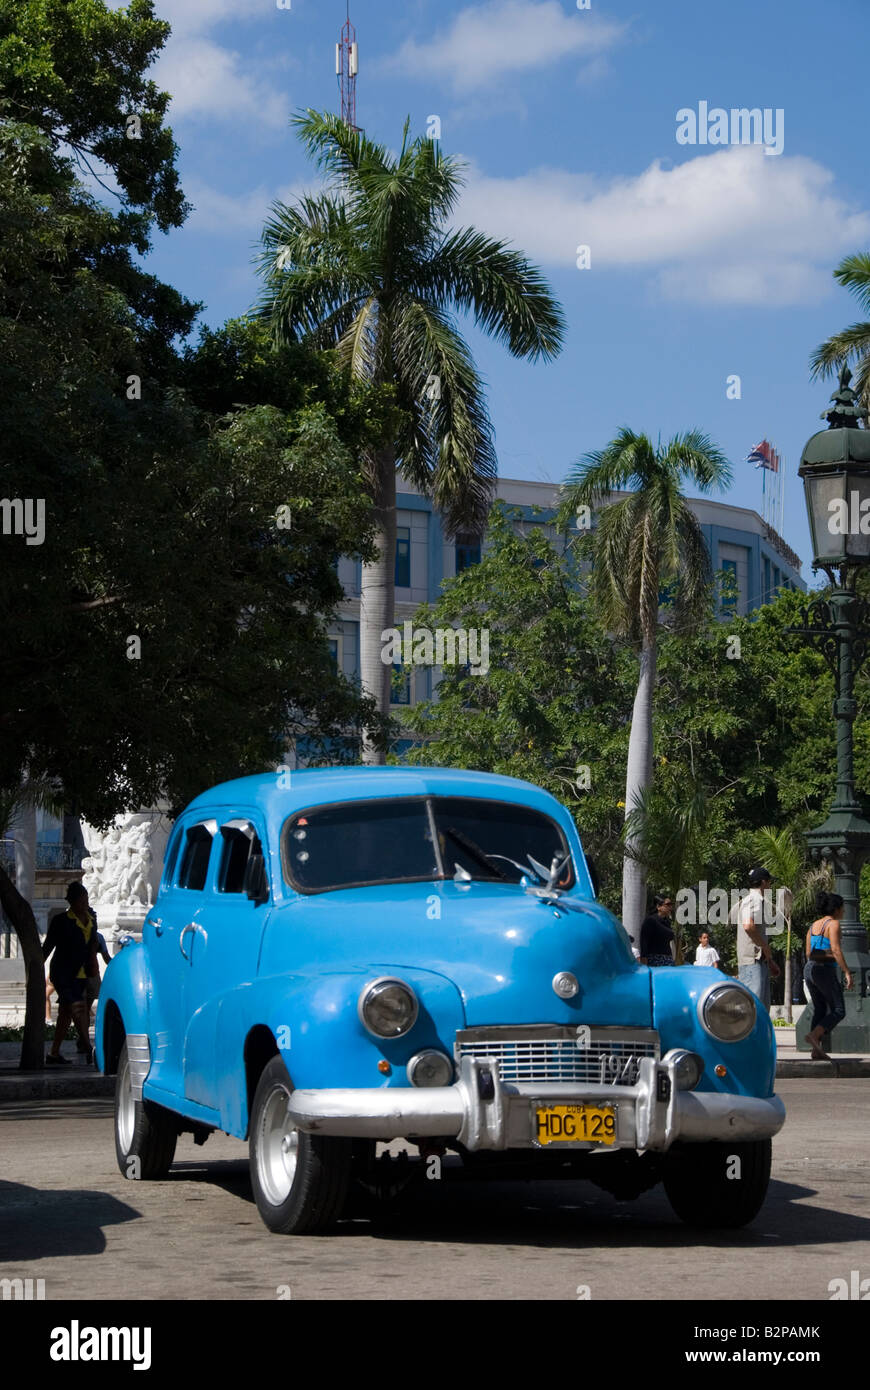 Alte amerikanische Oldtimer im Parque Central in Habana Vieja Havanna Kuba Stockbild